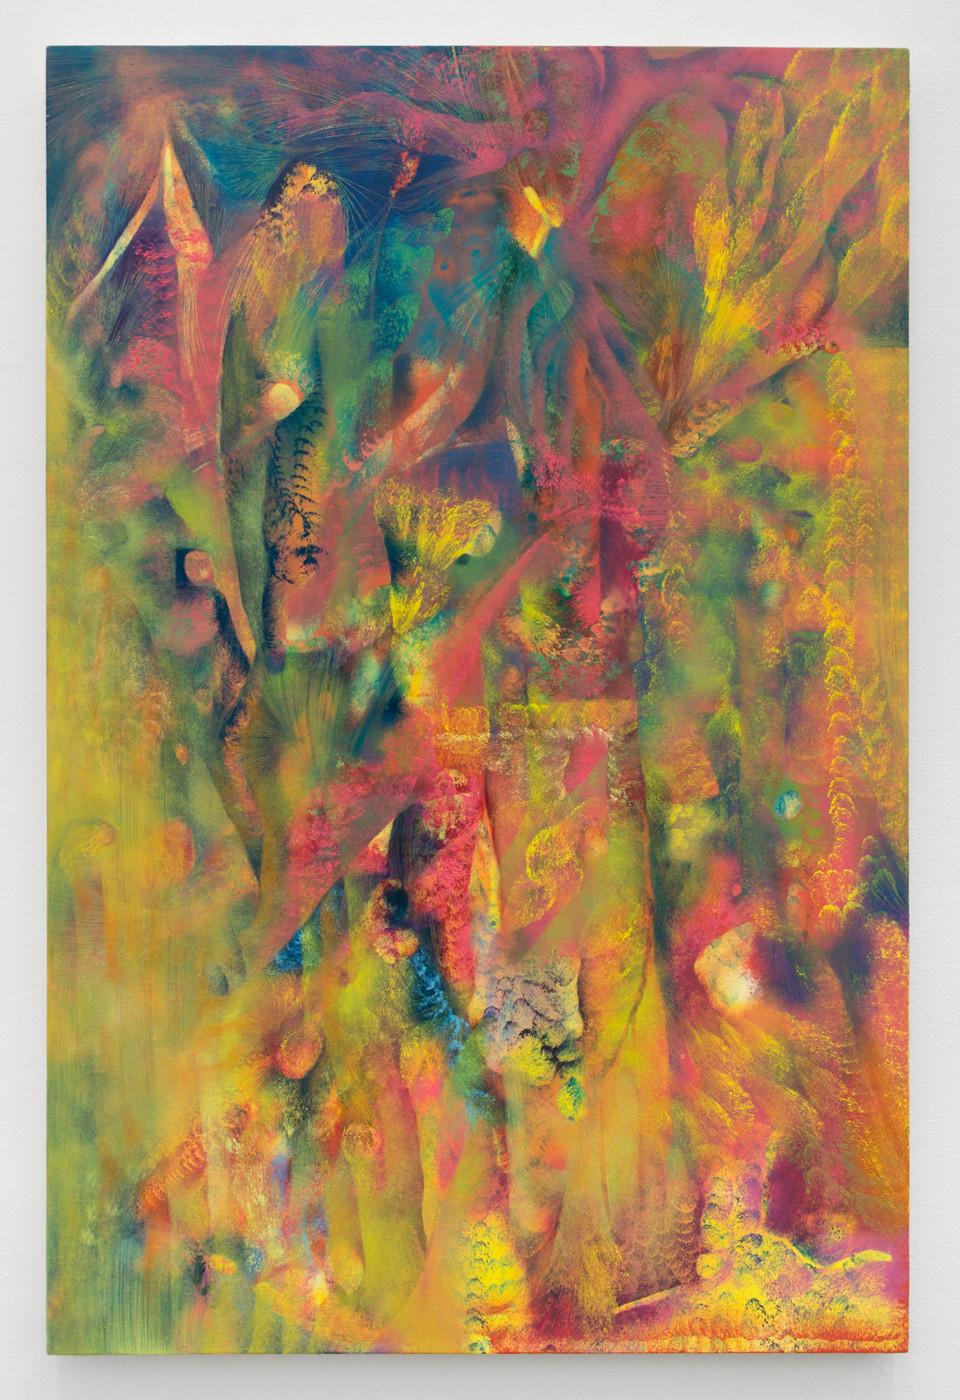 LUCY BULL  Neptune's Net , 2019 Oil on linen 127 x 83,8 cm / 50 x 33 in - High Art Gallery Paris